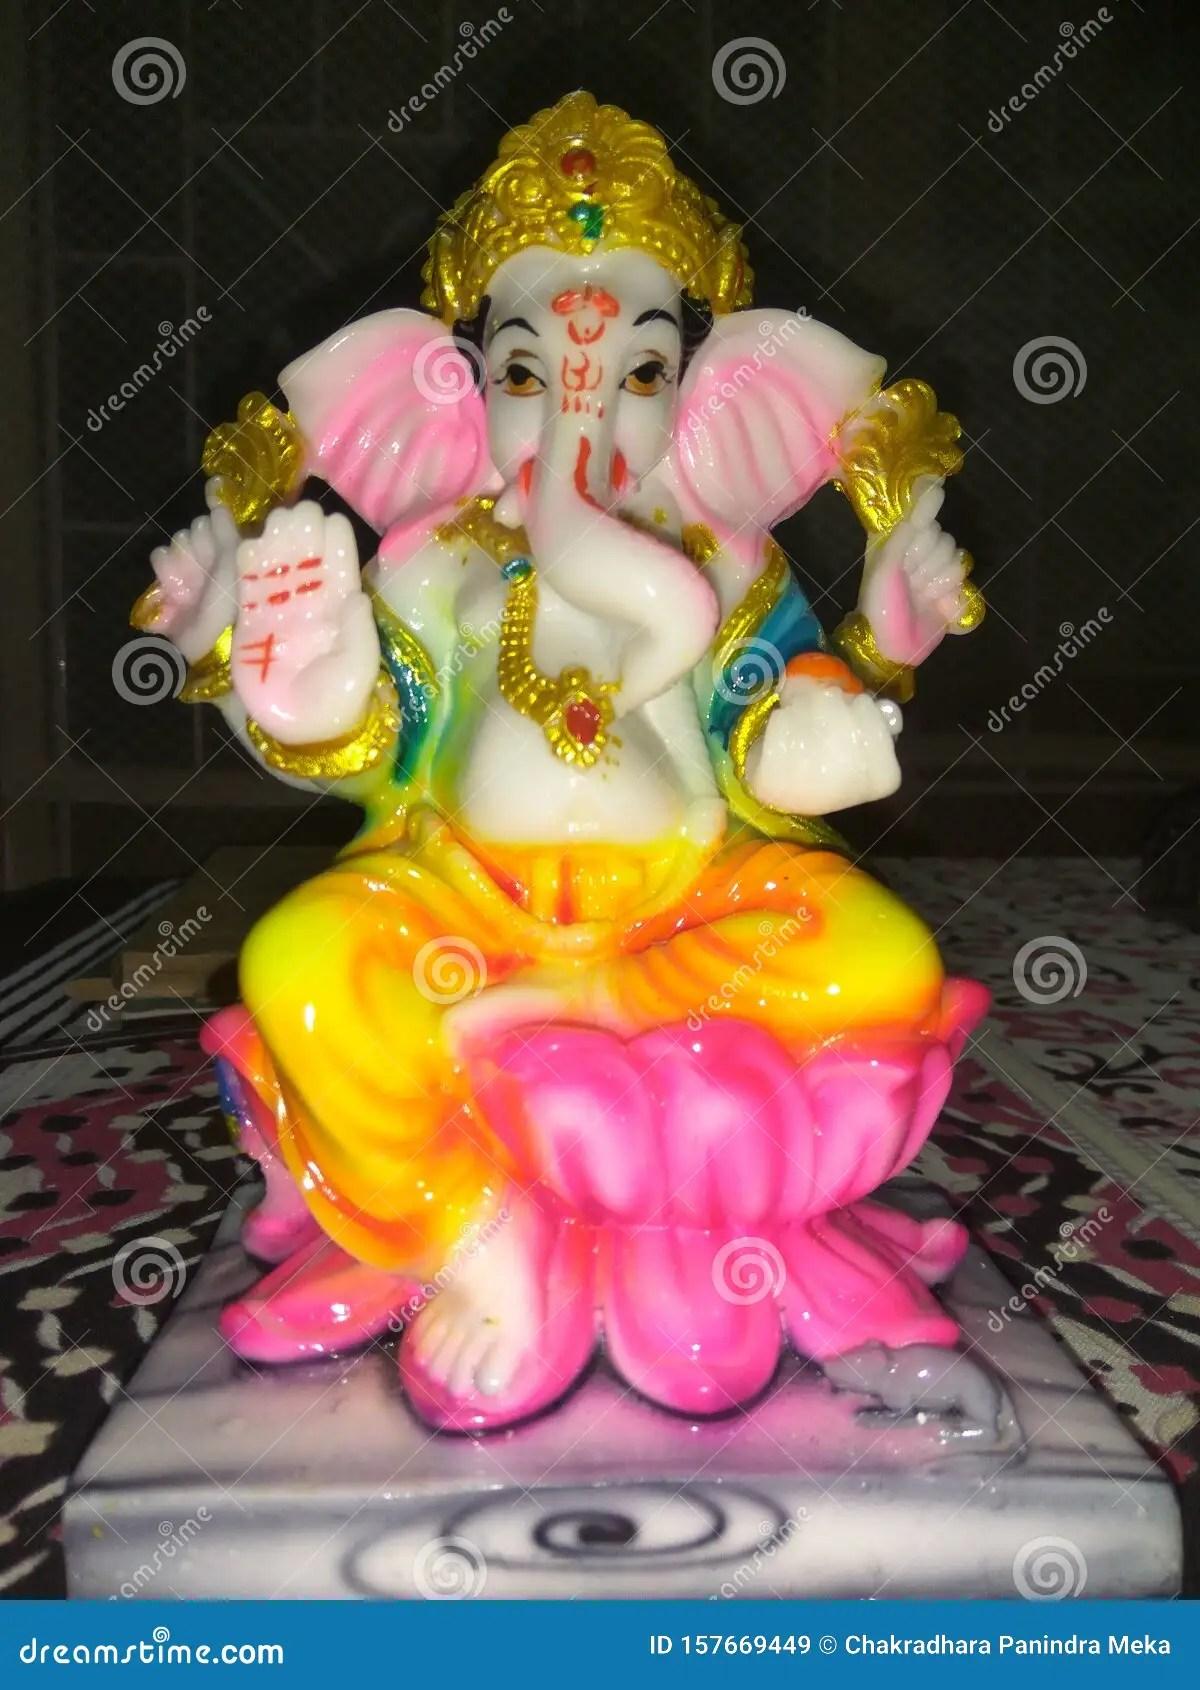 Lord Vinayaka Ganesh Idol With Focus Stock Image Image Of Motor Numerous 157669449